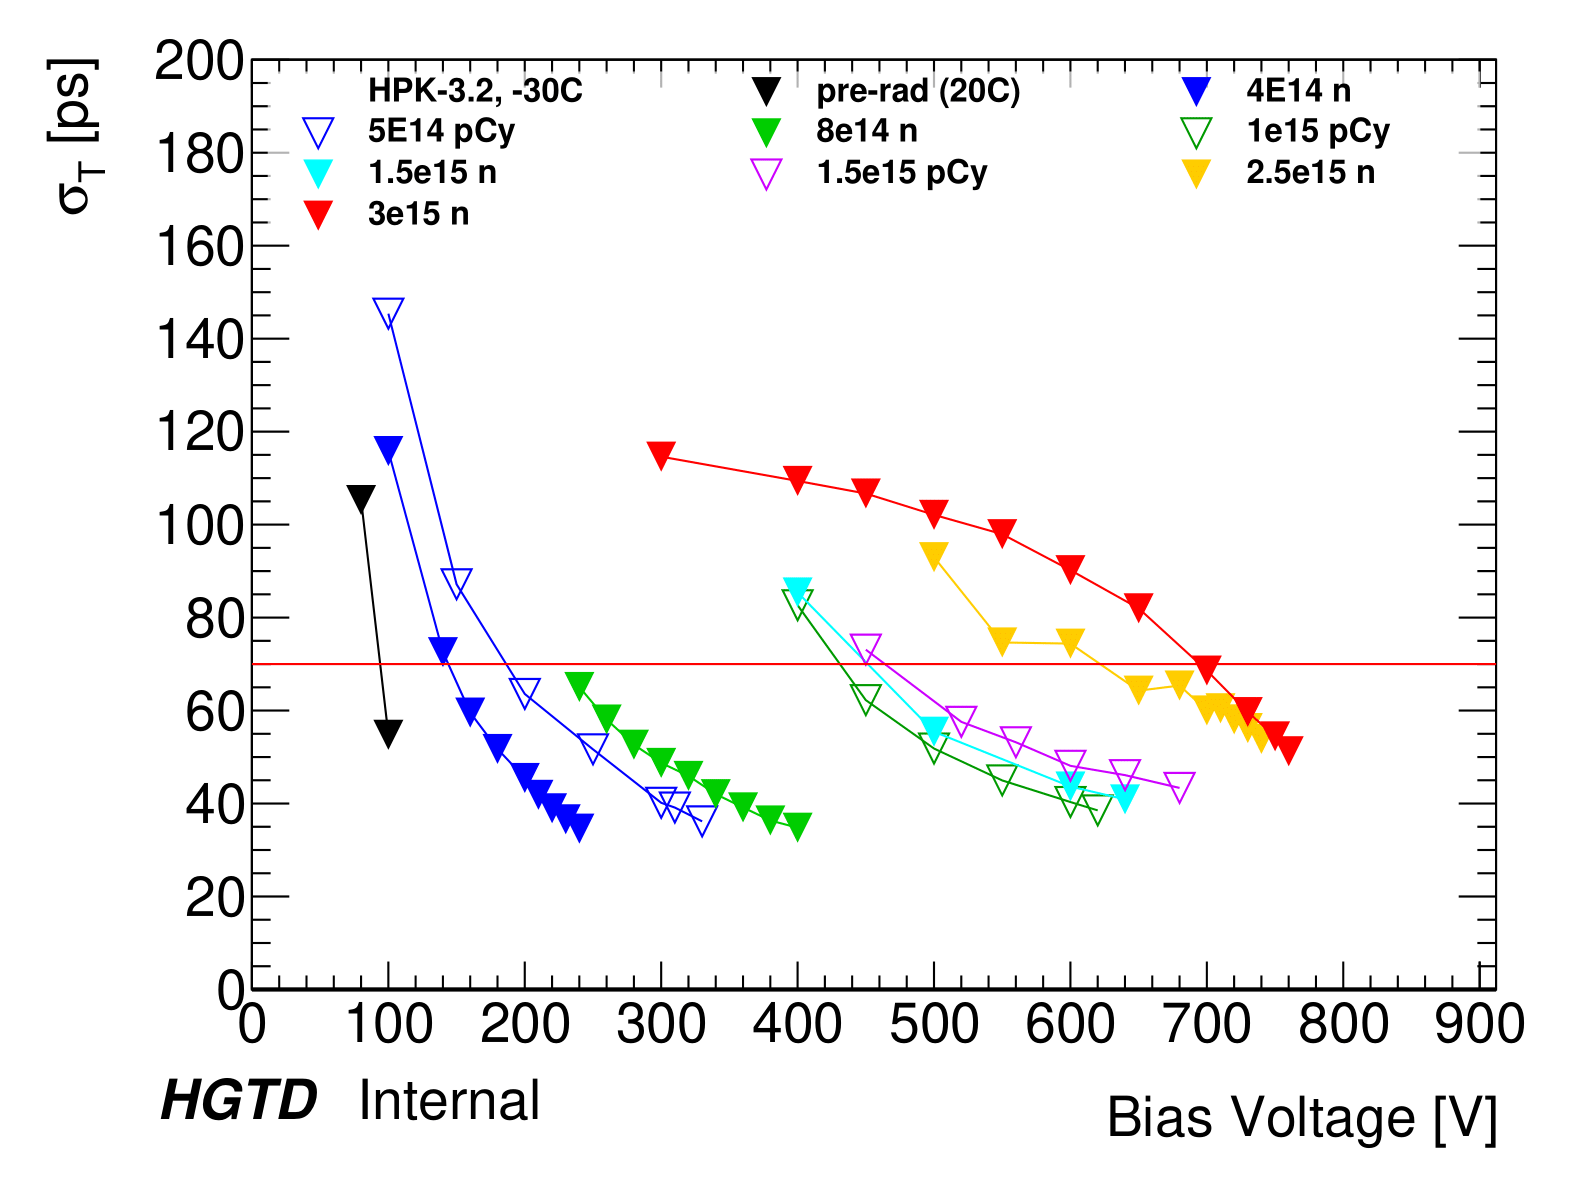 Plot_HPK32_bias_voltage_vs_time_res-1.png